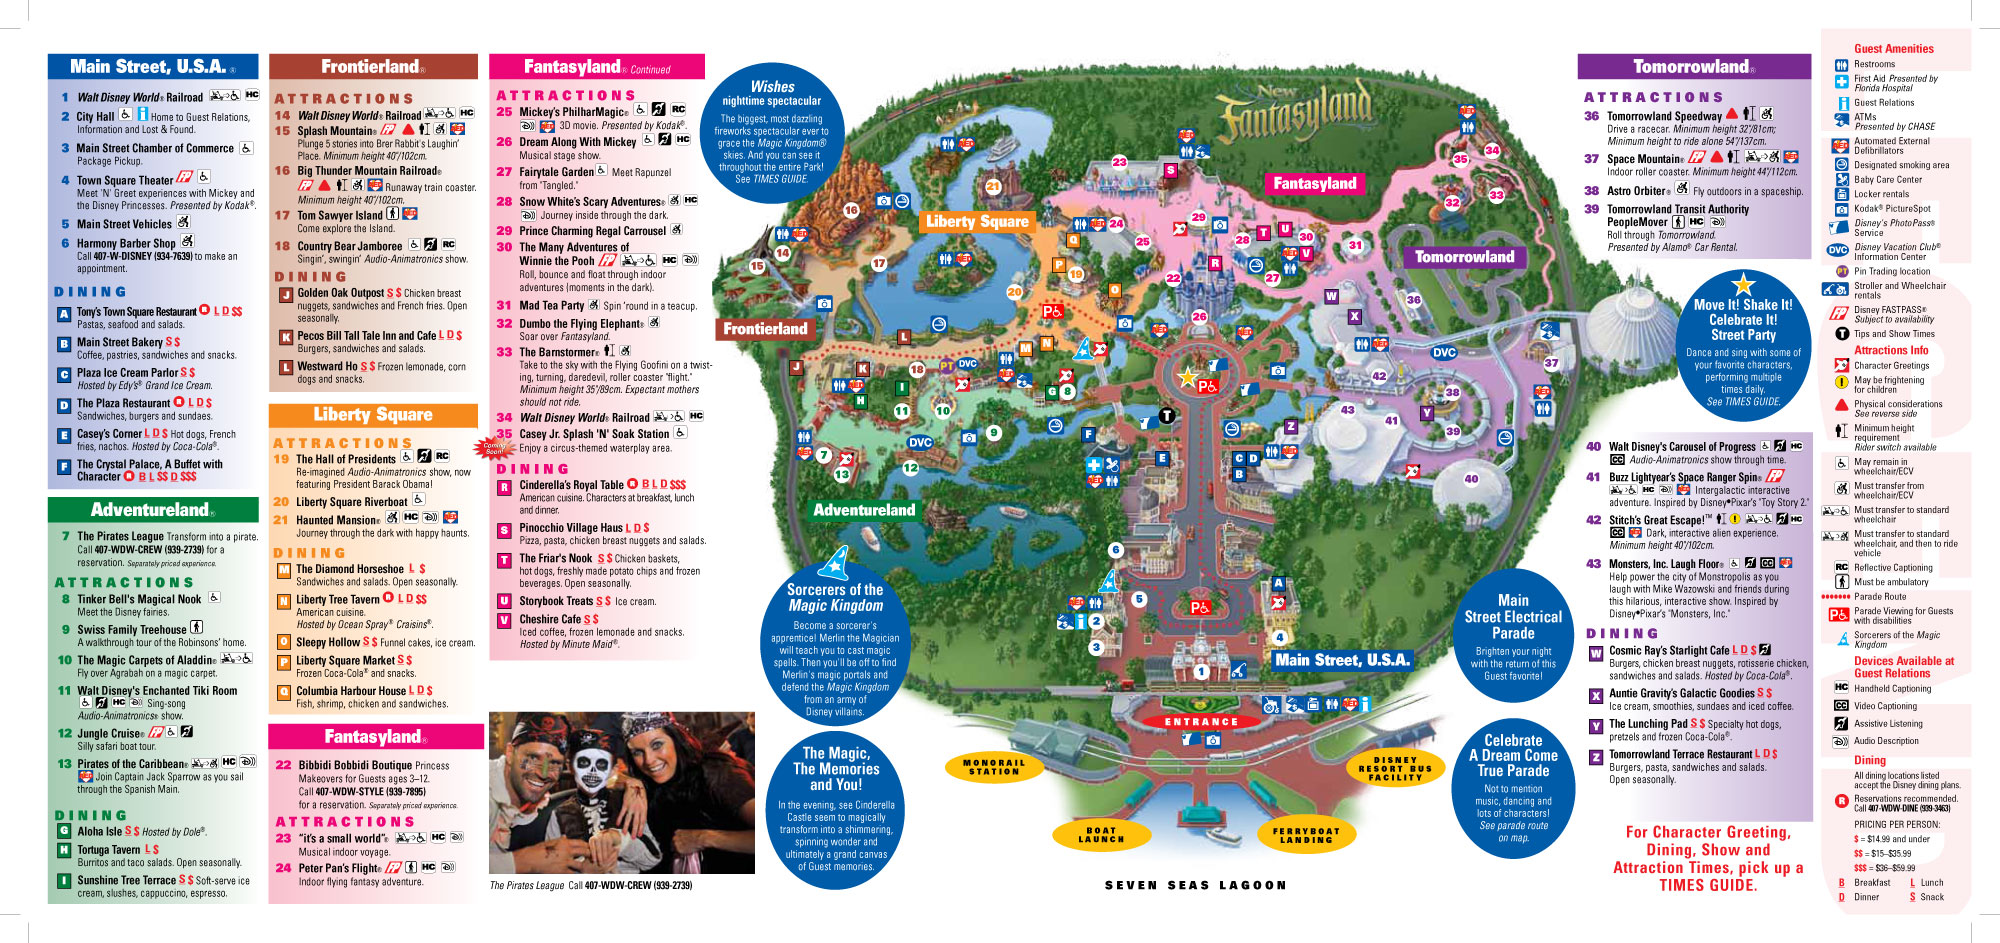 Disney Magic Cruise Water Slide